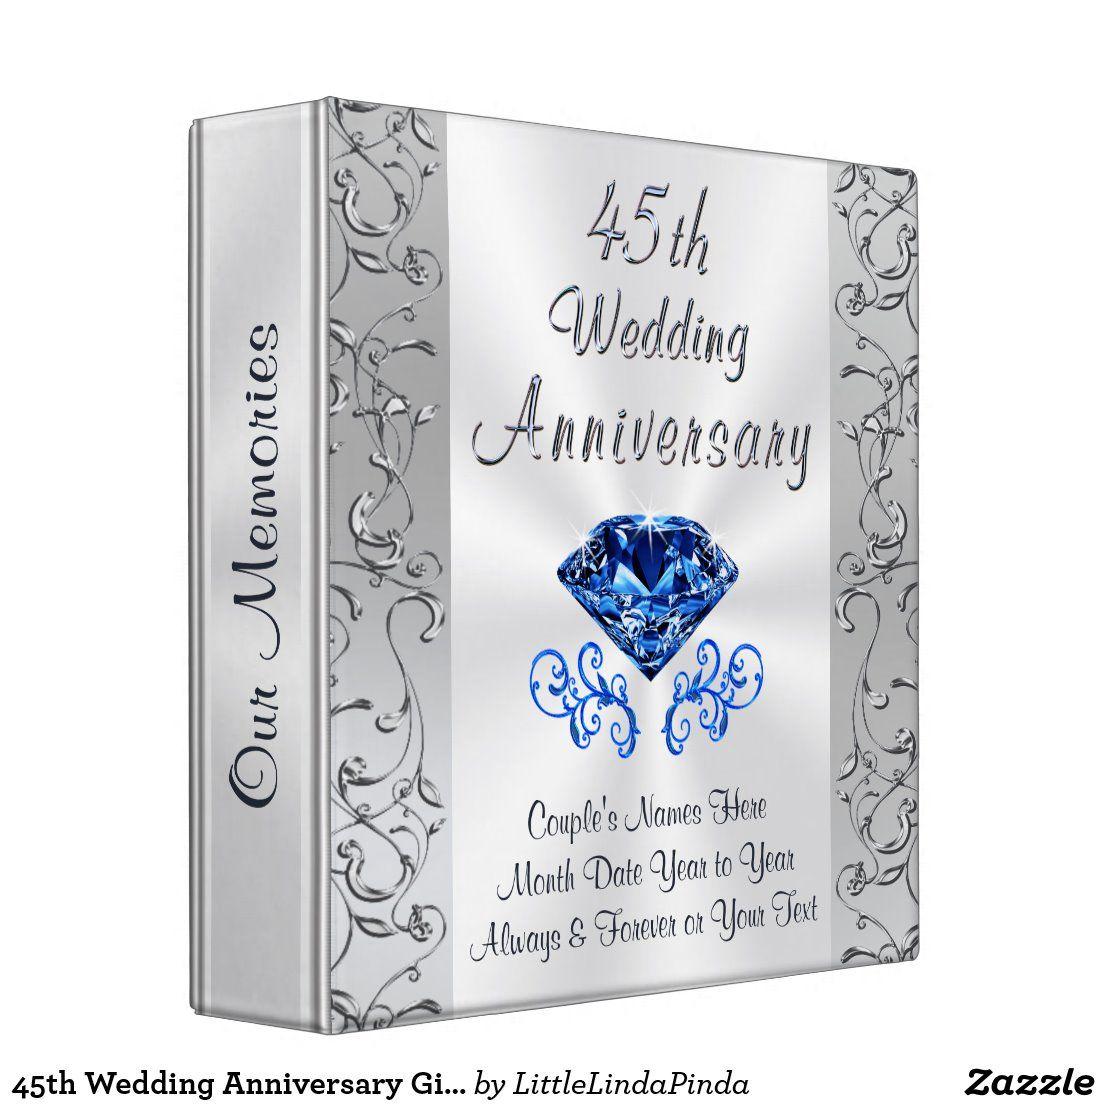 45th wedding anniversary gift ideas photo album 3 ring